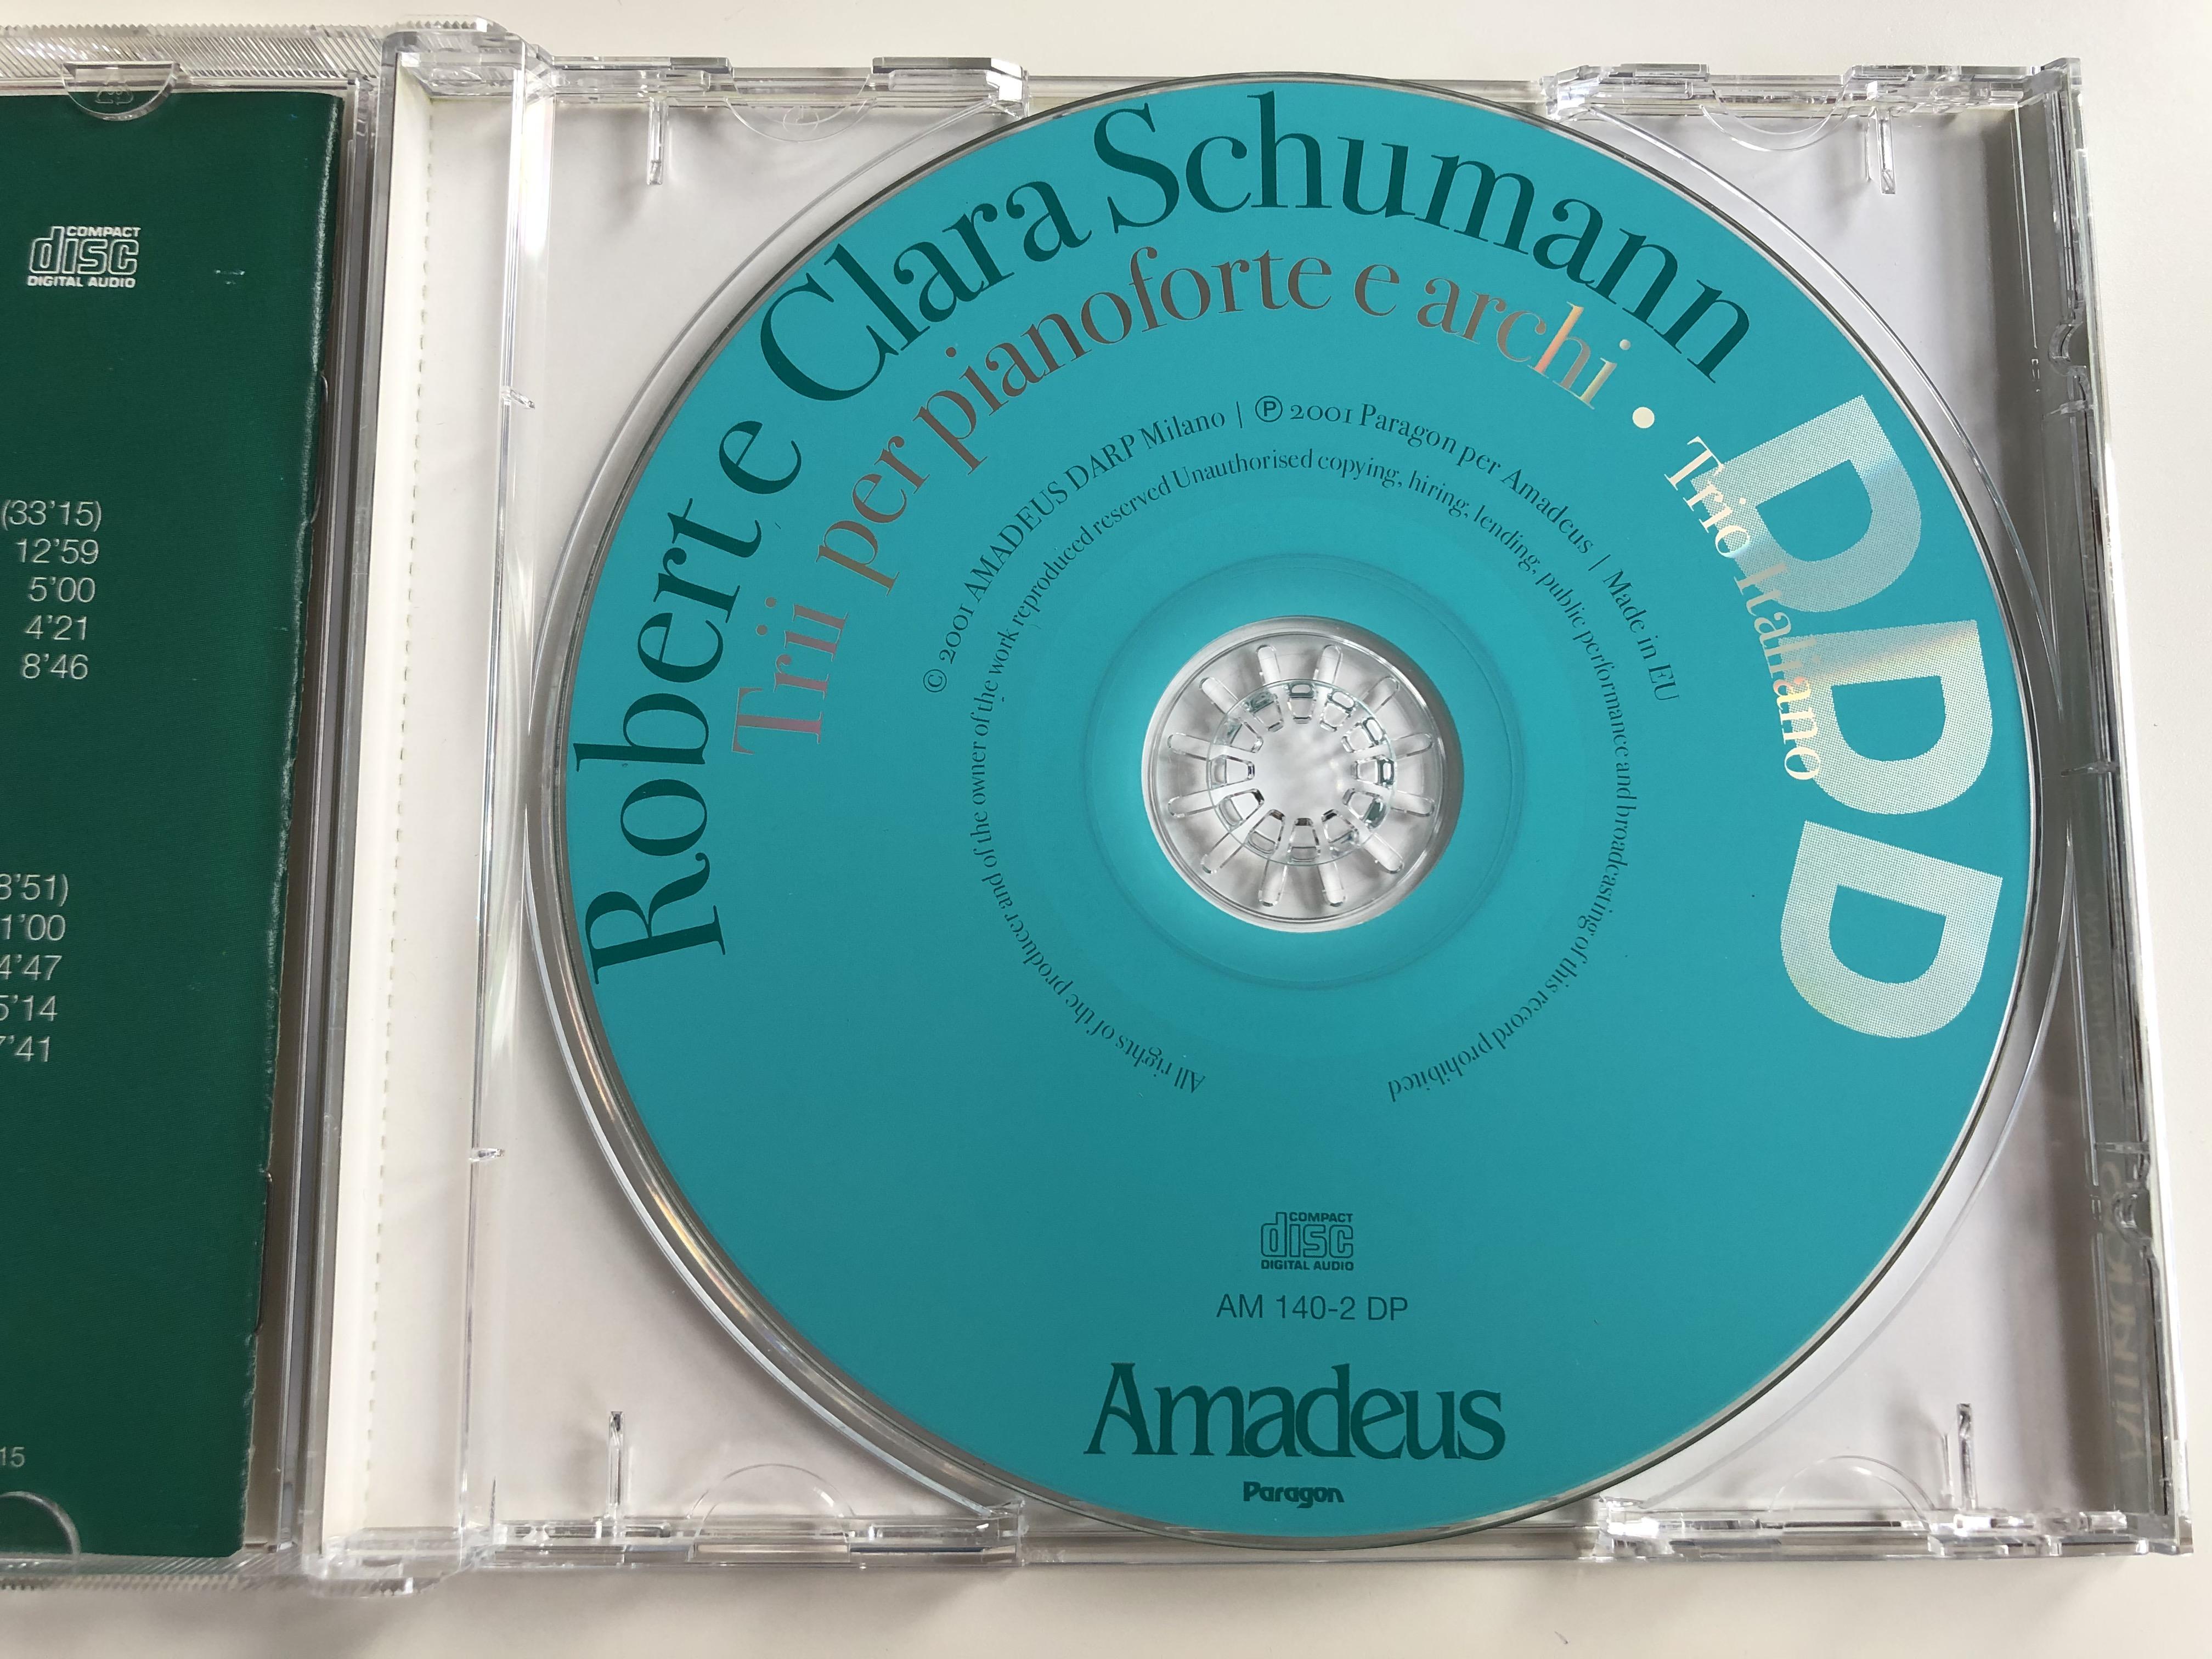 trii-per-pianoforte-e-archi-trio-italiano-robert-e-clara-schumann-amadeus-audio-cd-2001-am-140-2-9-.jpg